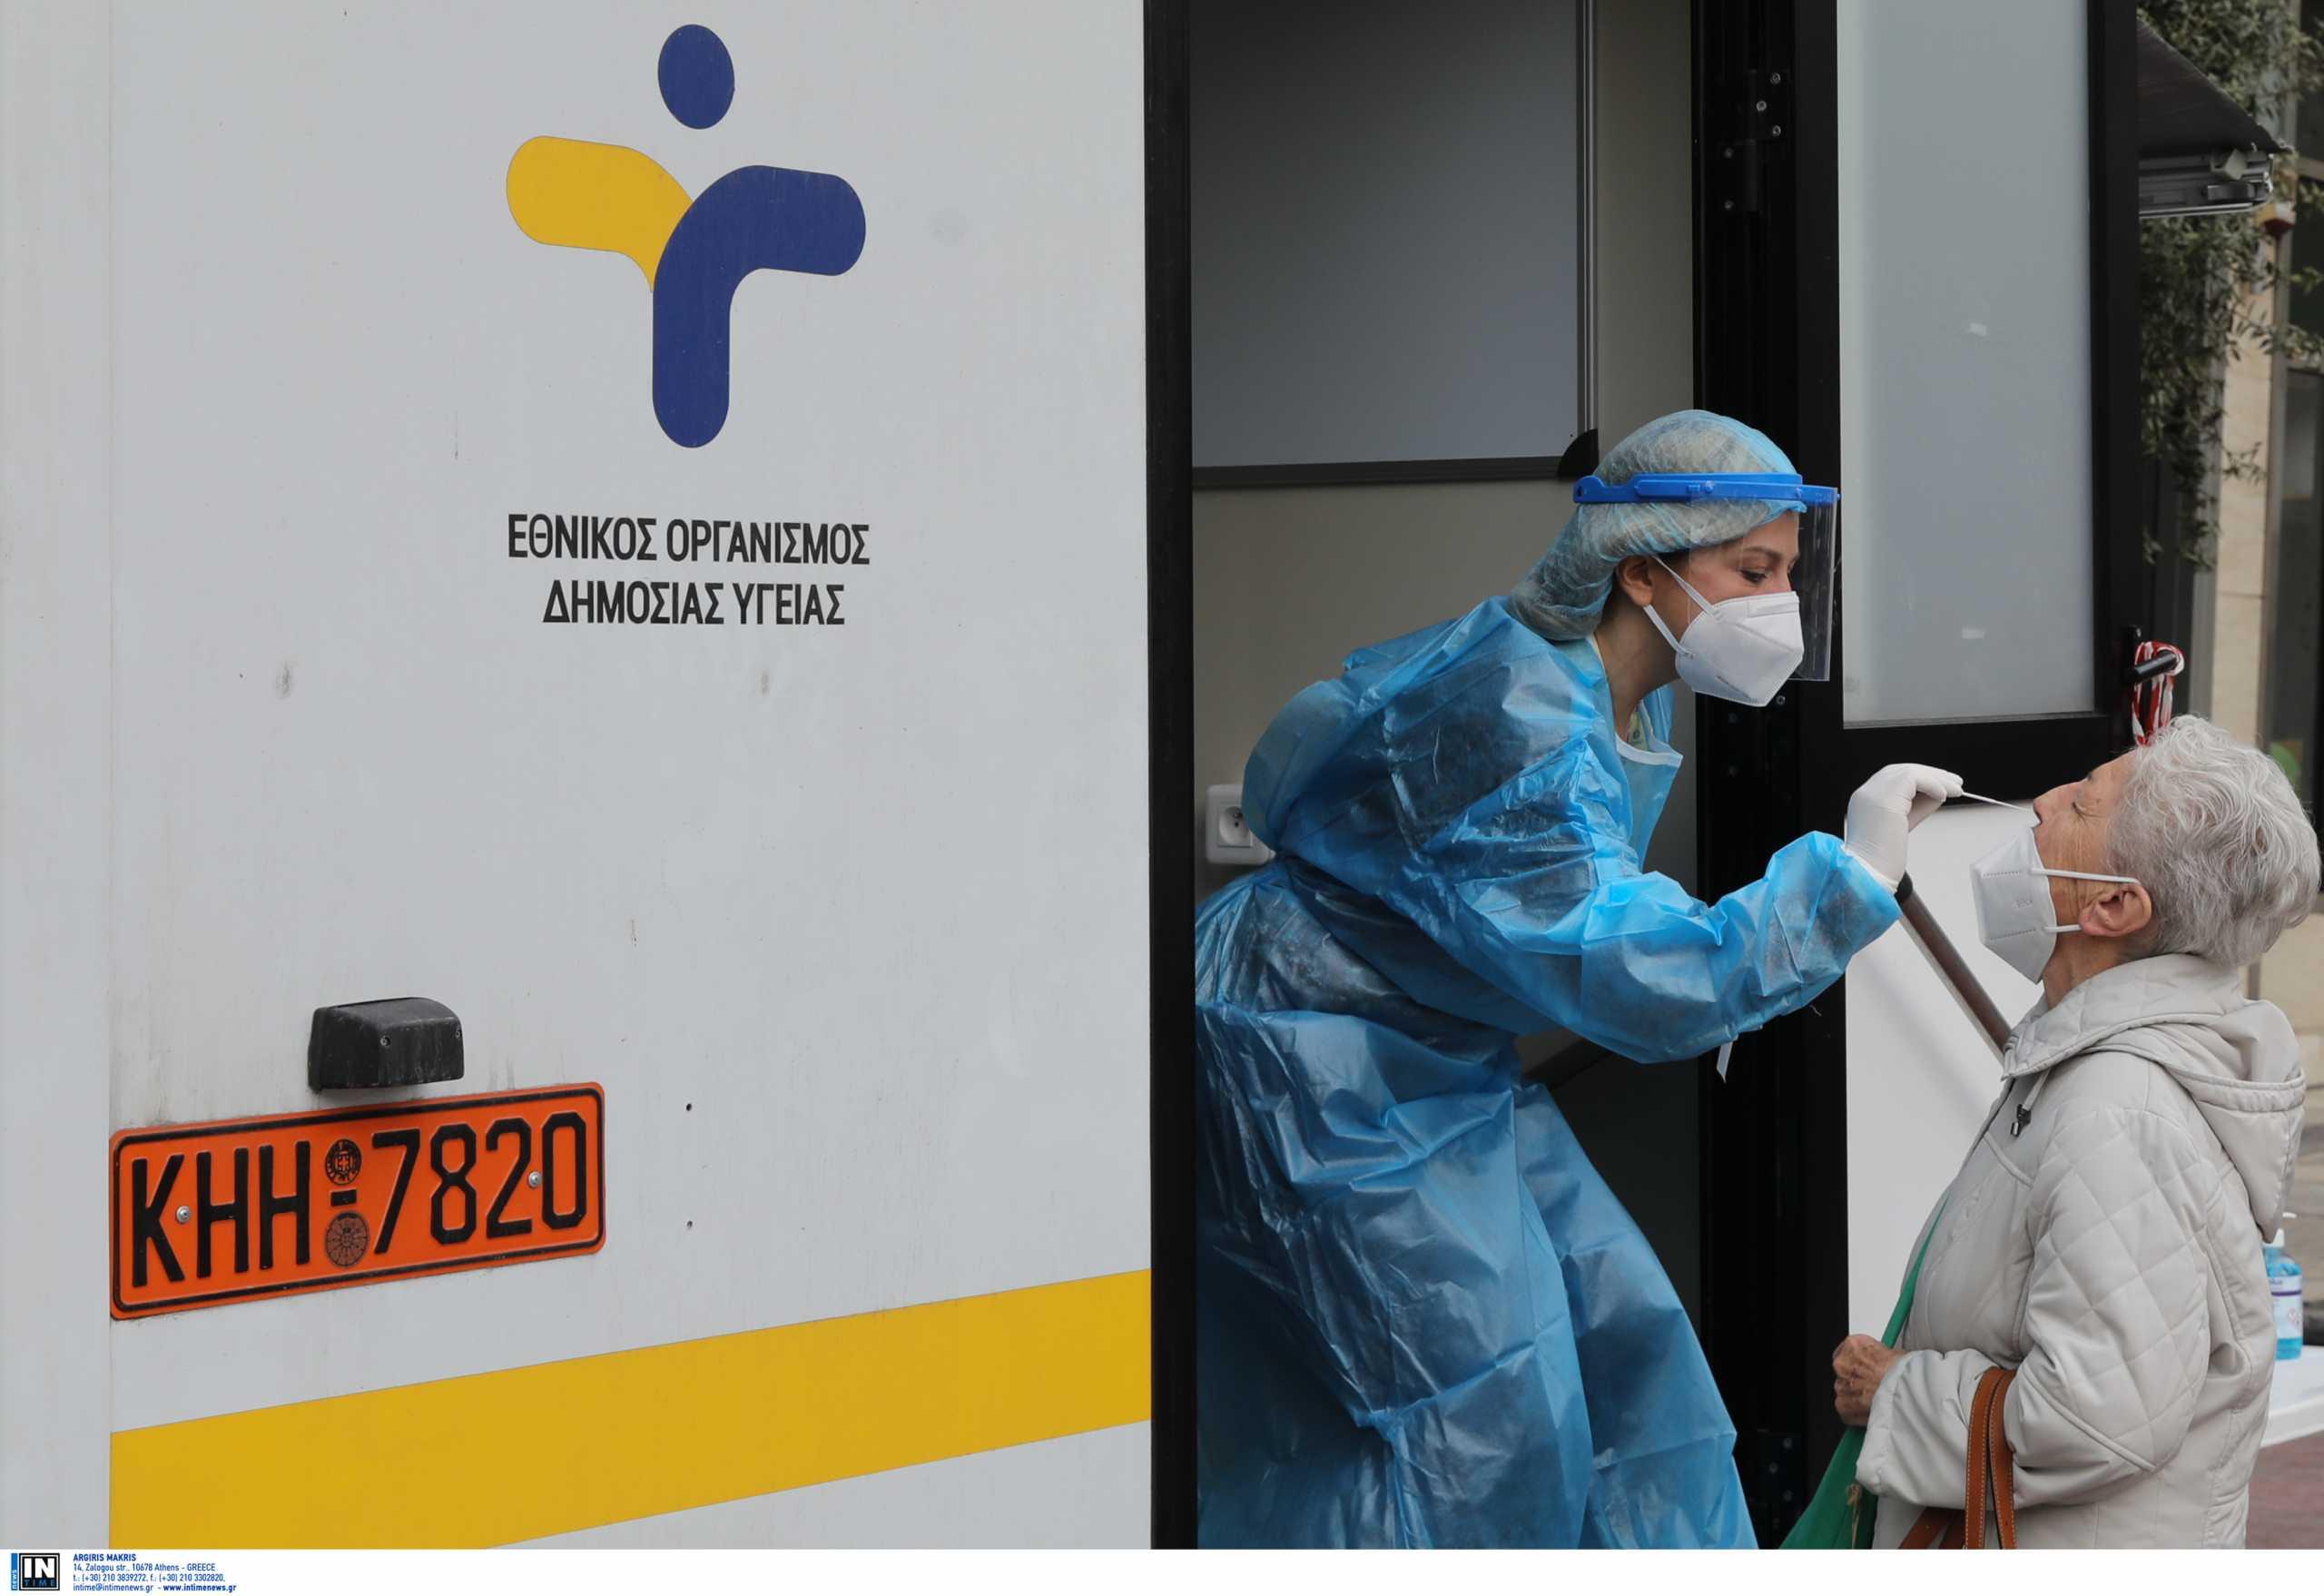 Rapid test: Πόσα κρούσματα ανίχνευσε ο ΕΟΔΥ σε 55 περιοχές